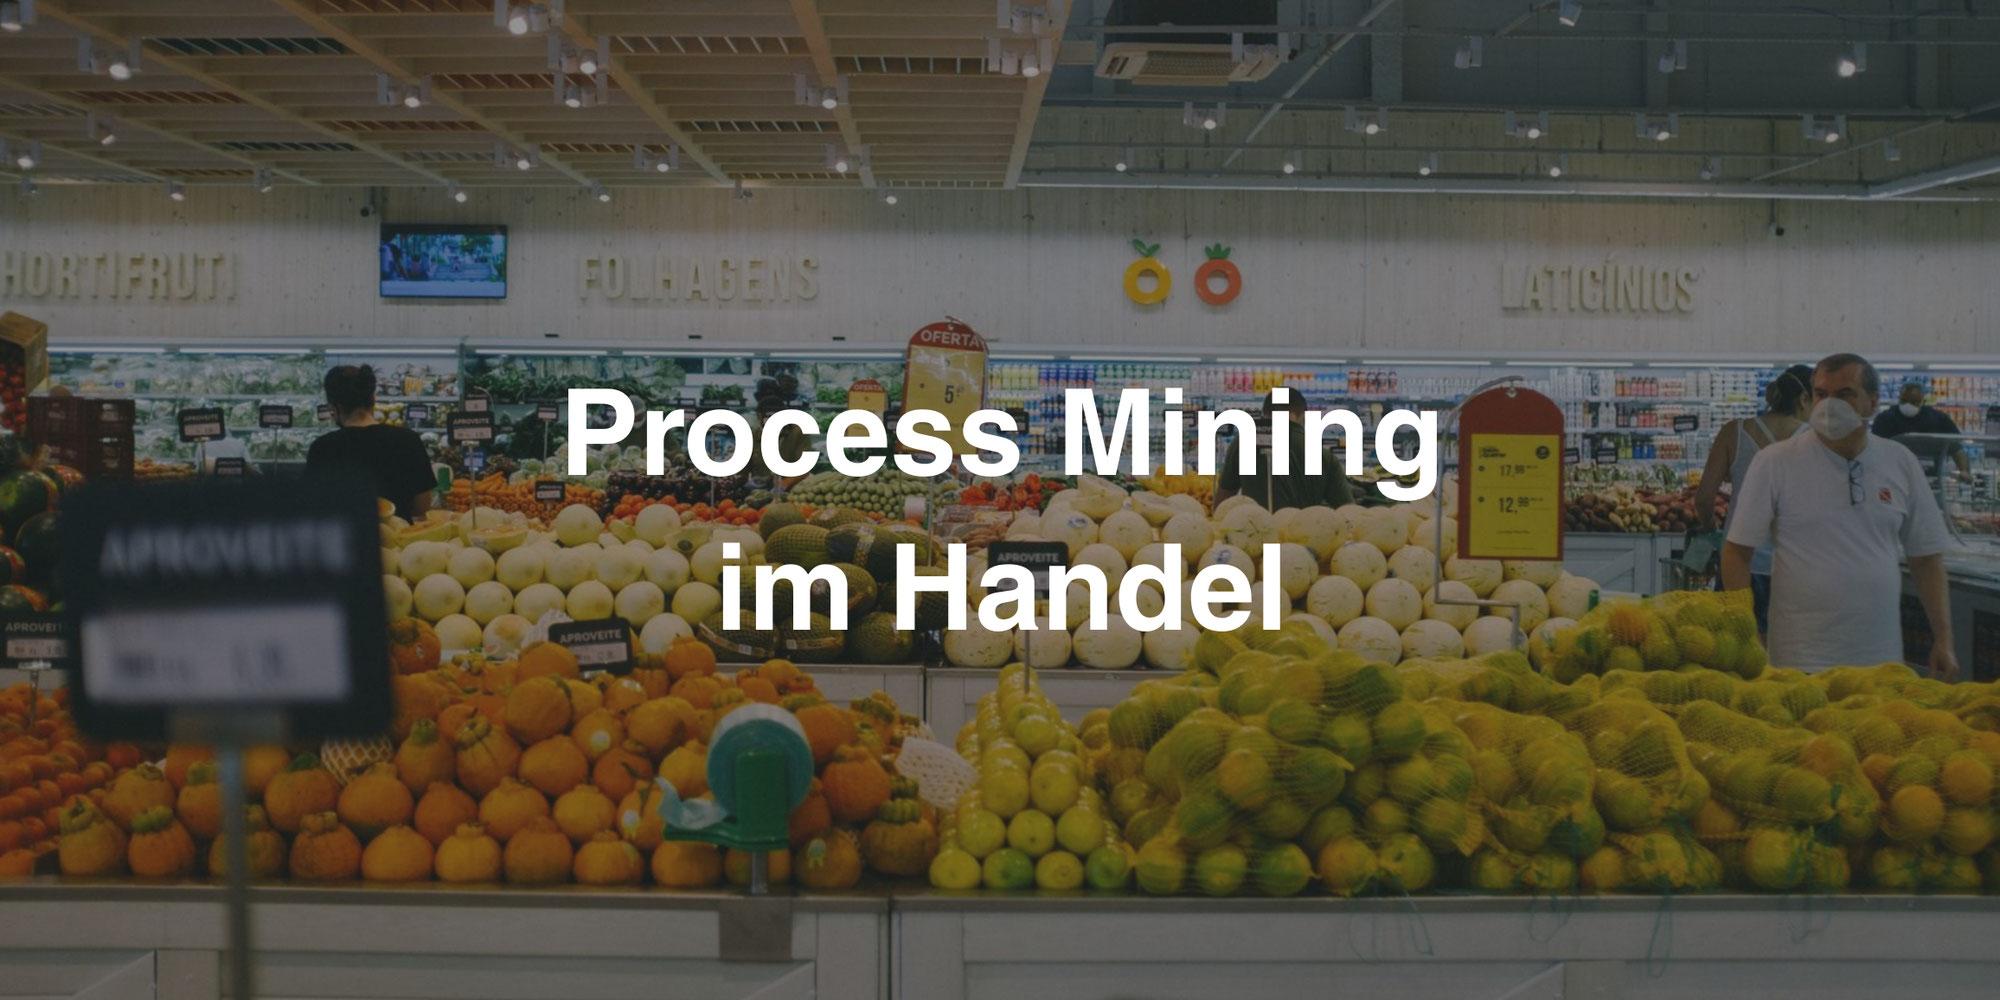 Process Mining im Handel